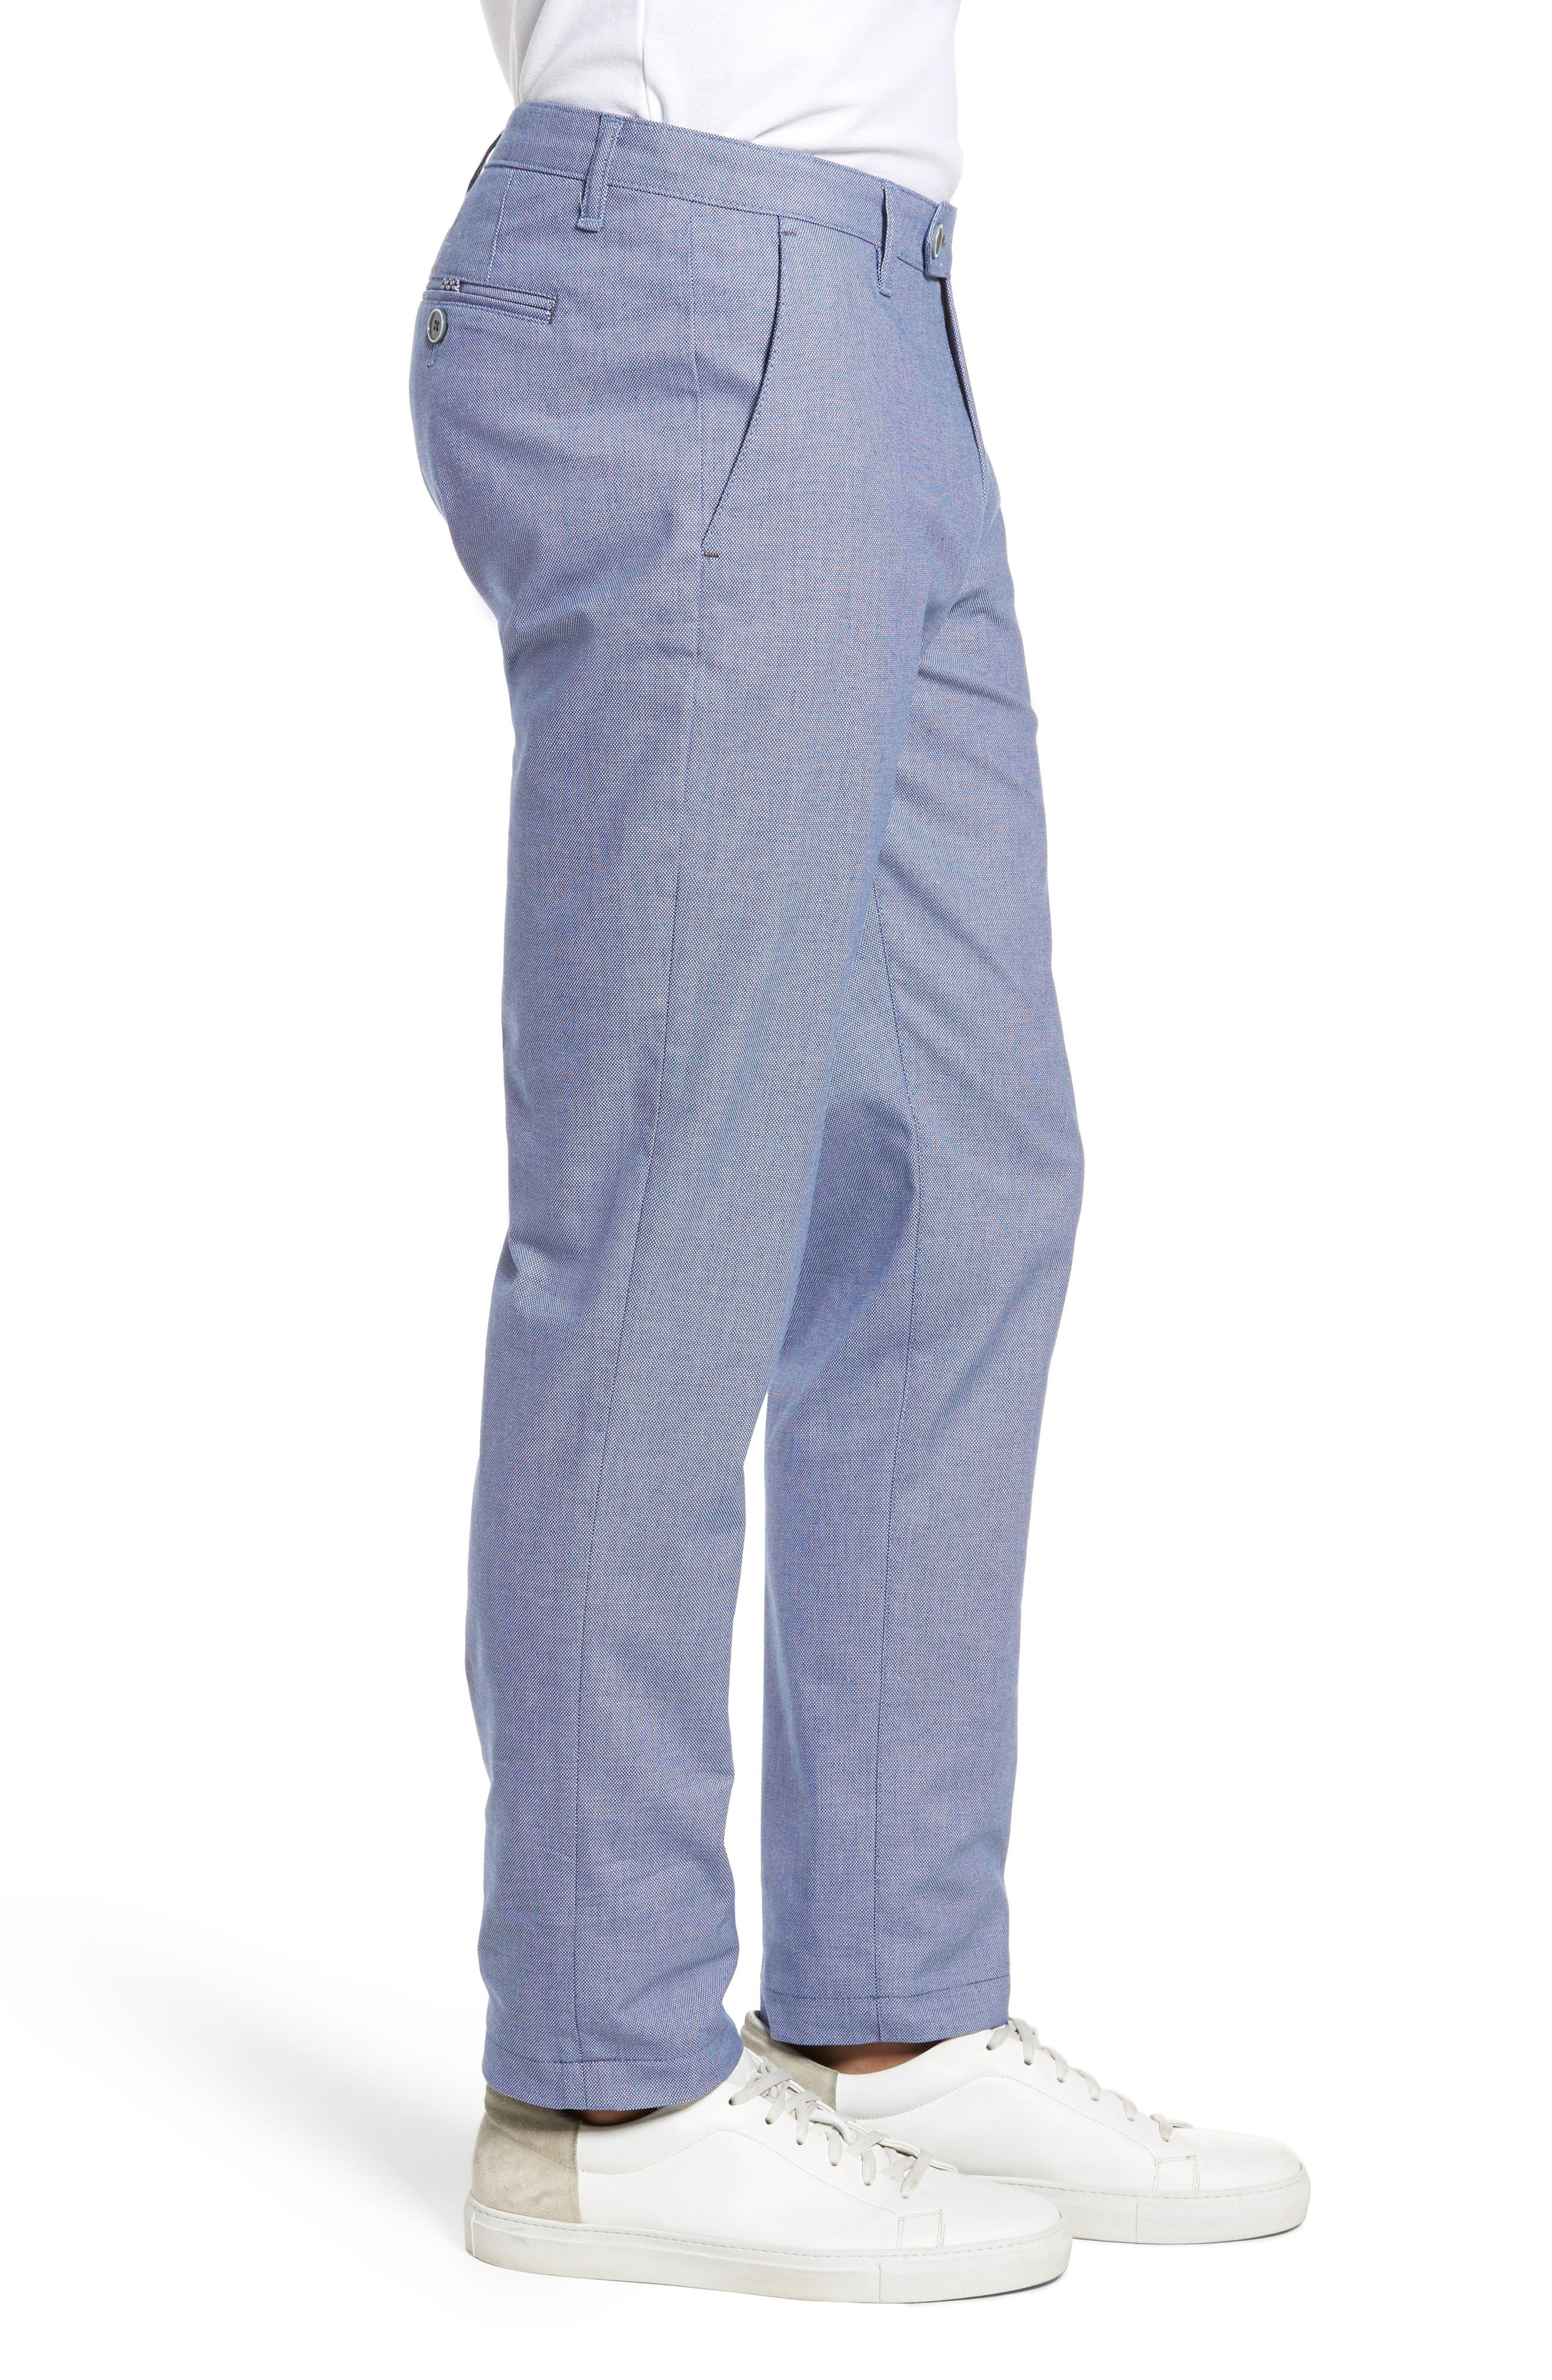 Holldet Flat Front Stretch Solid Cotton Pants,                             Alternate thumbnail 3, color,                             Light Blue